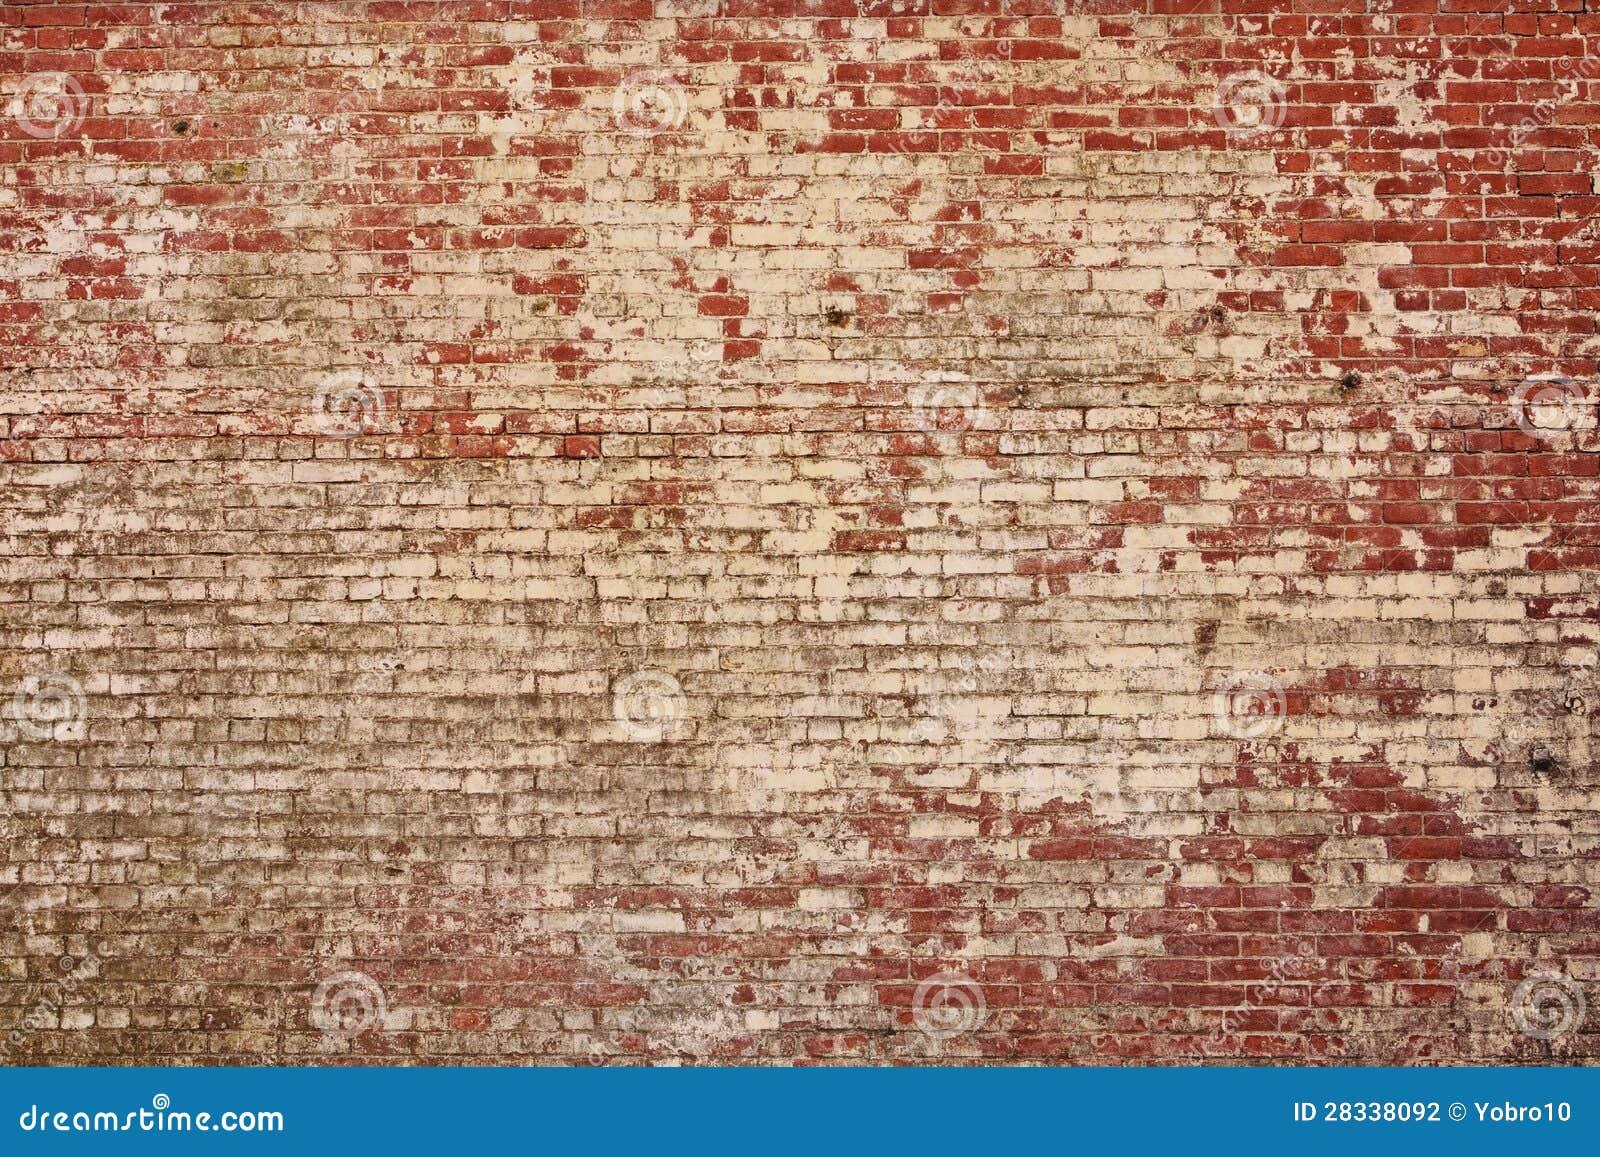 Paint Peeling From Interior Brick Walls